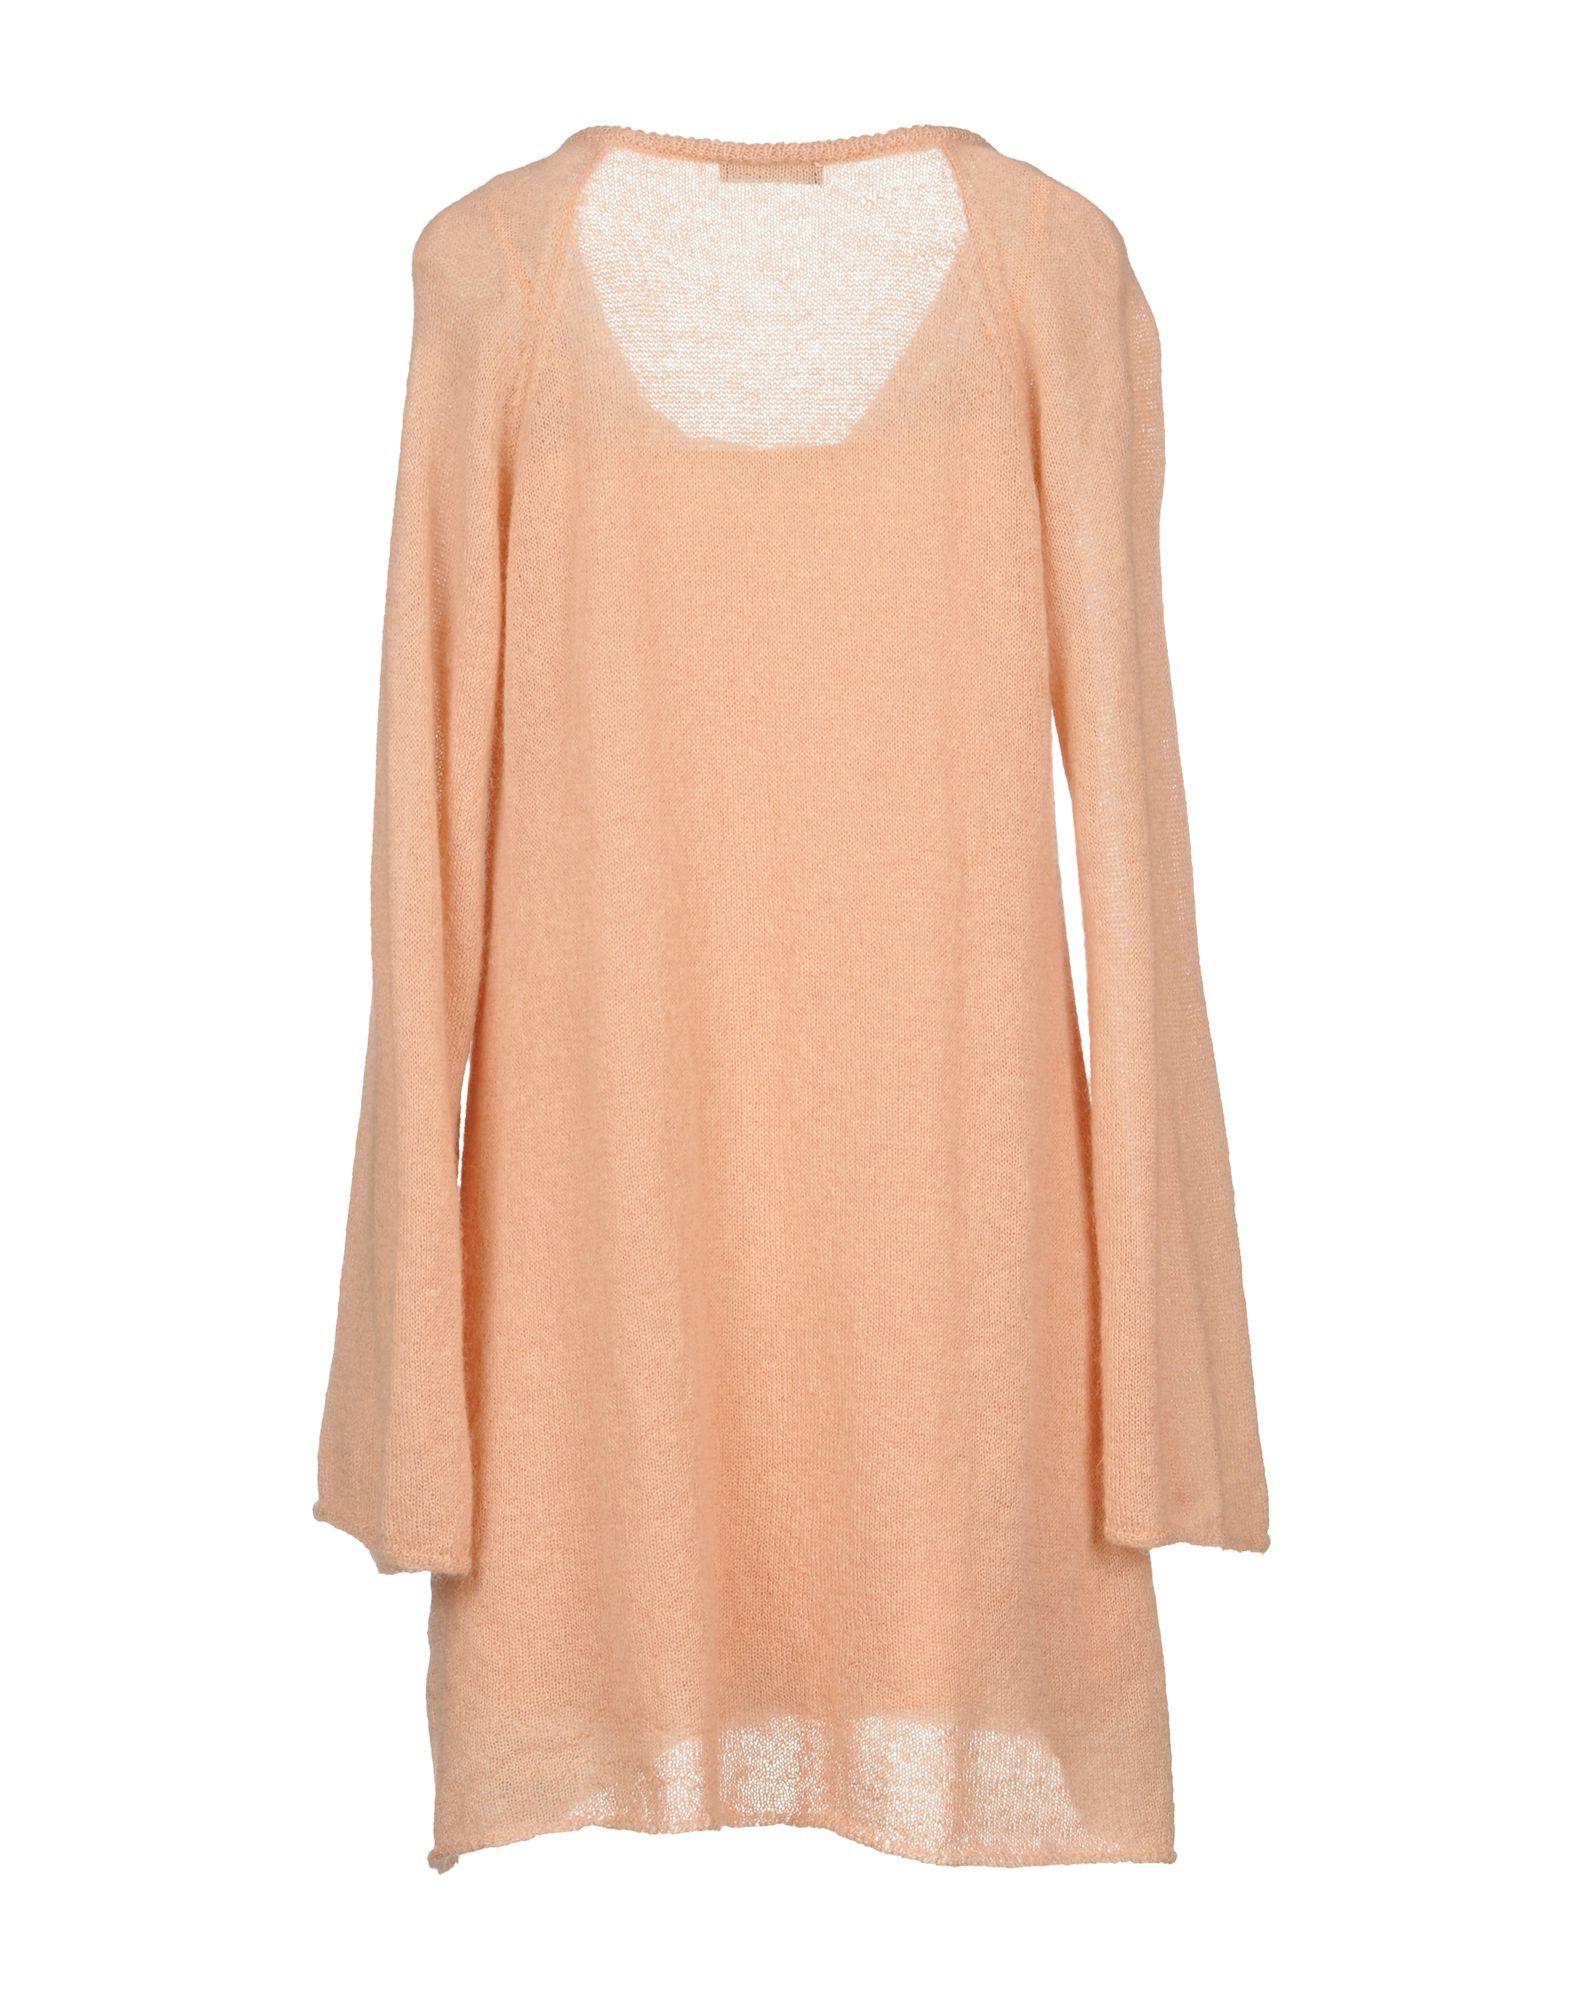 Twinset Apricot Mohair Wool Long Sleeve Jumper Dress